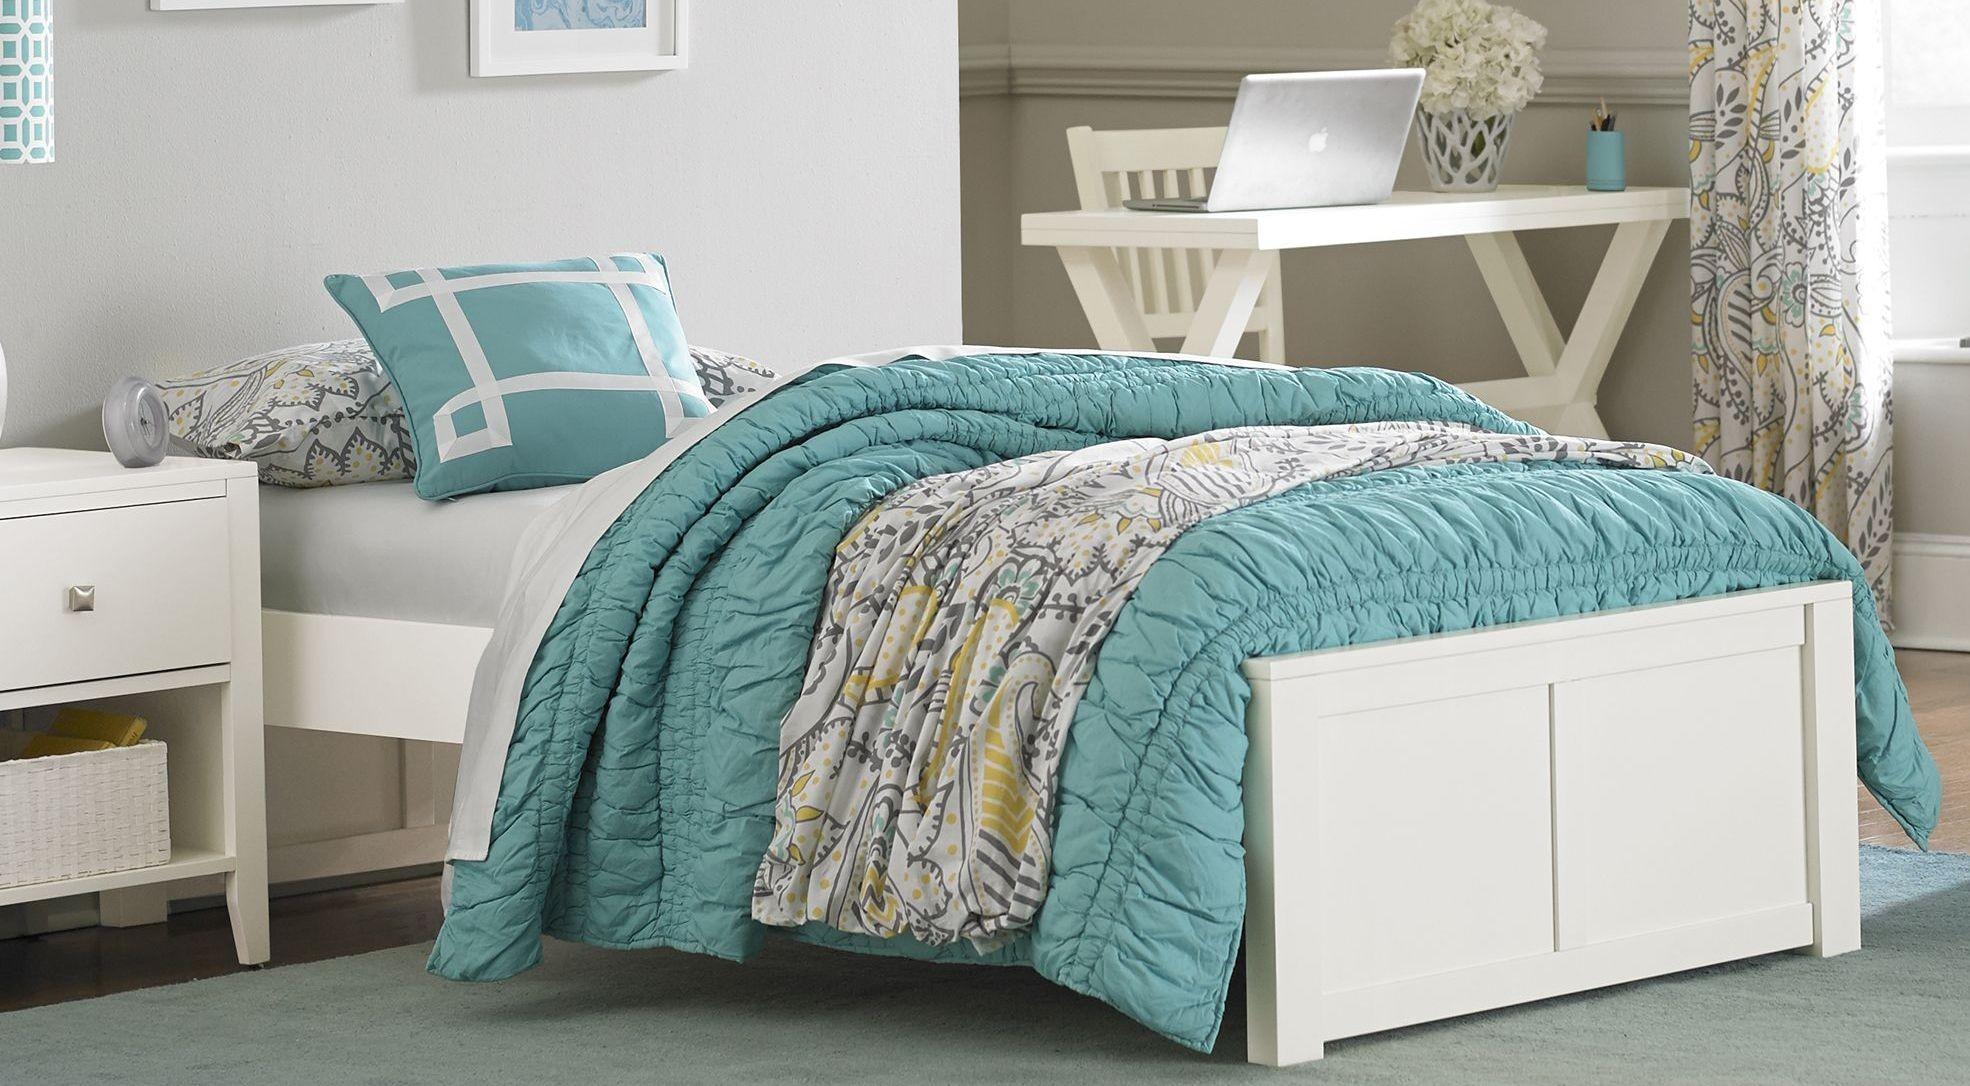 Pulse White Twin Platform Bed from NE Kids | Coleman Furniture